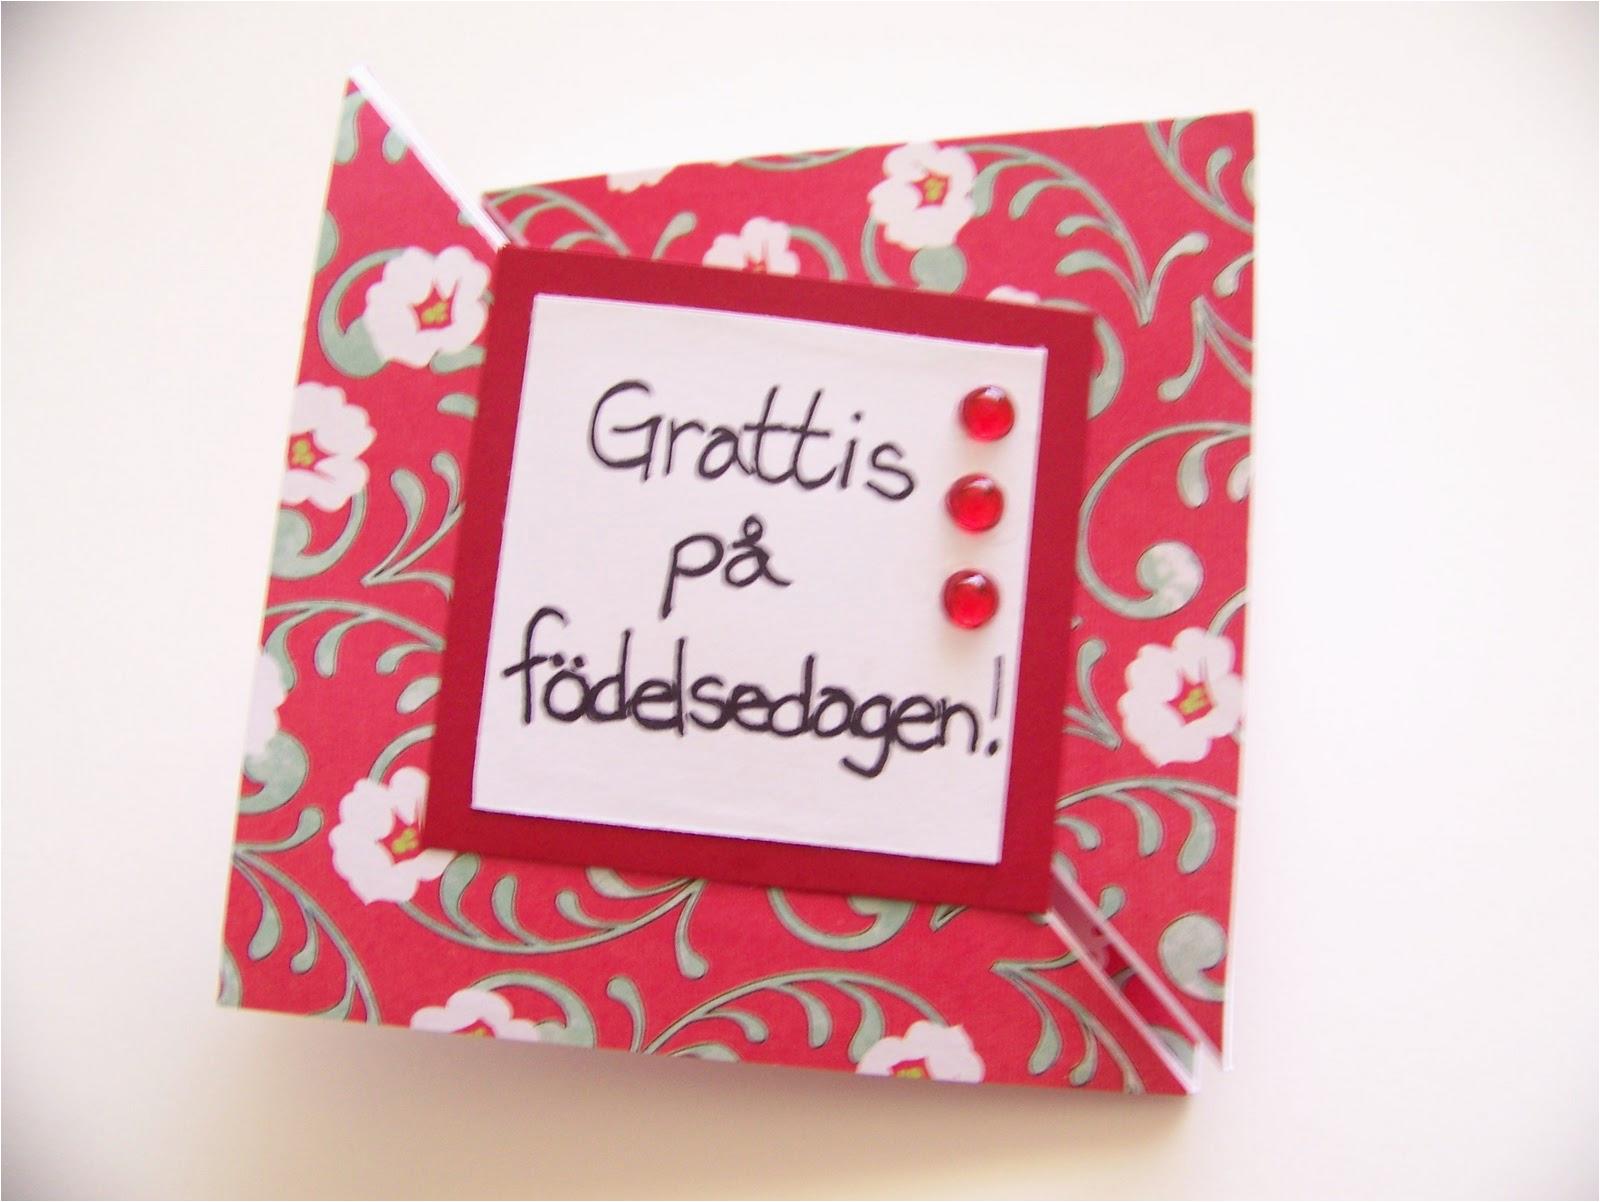 cre8tivegirls swedish birthday card